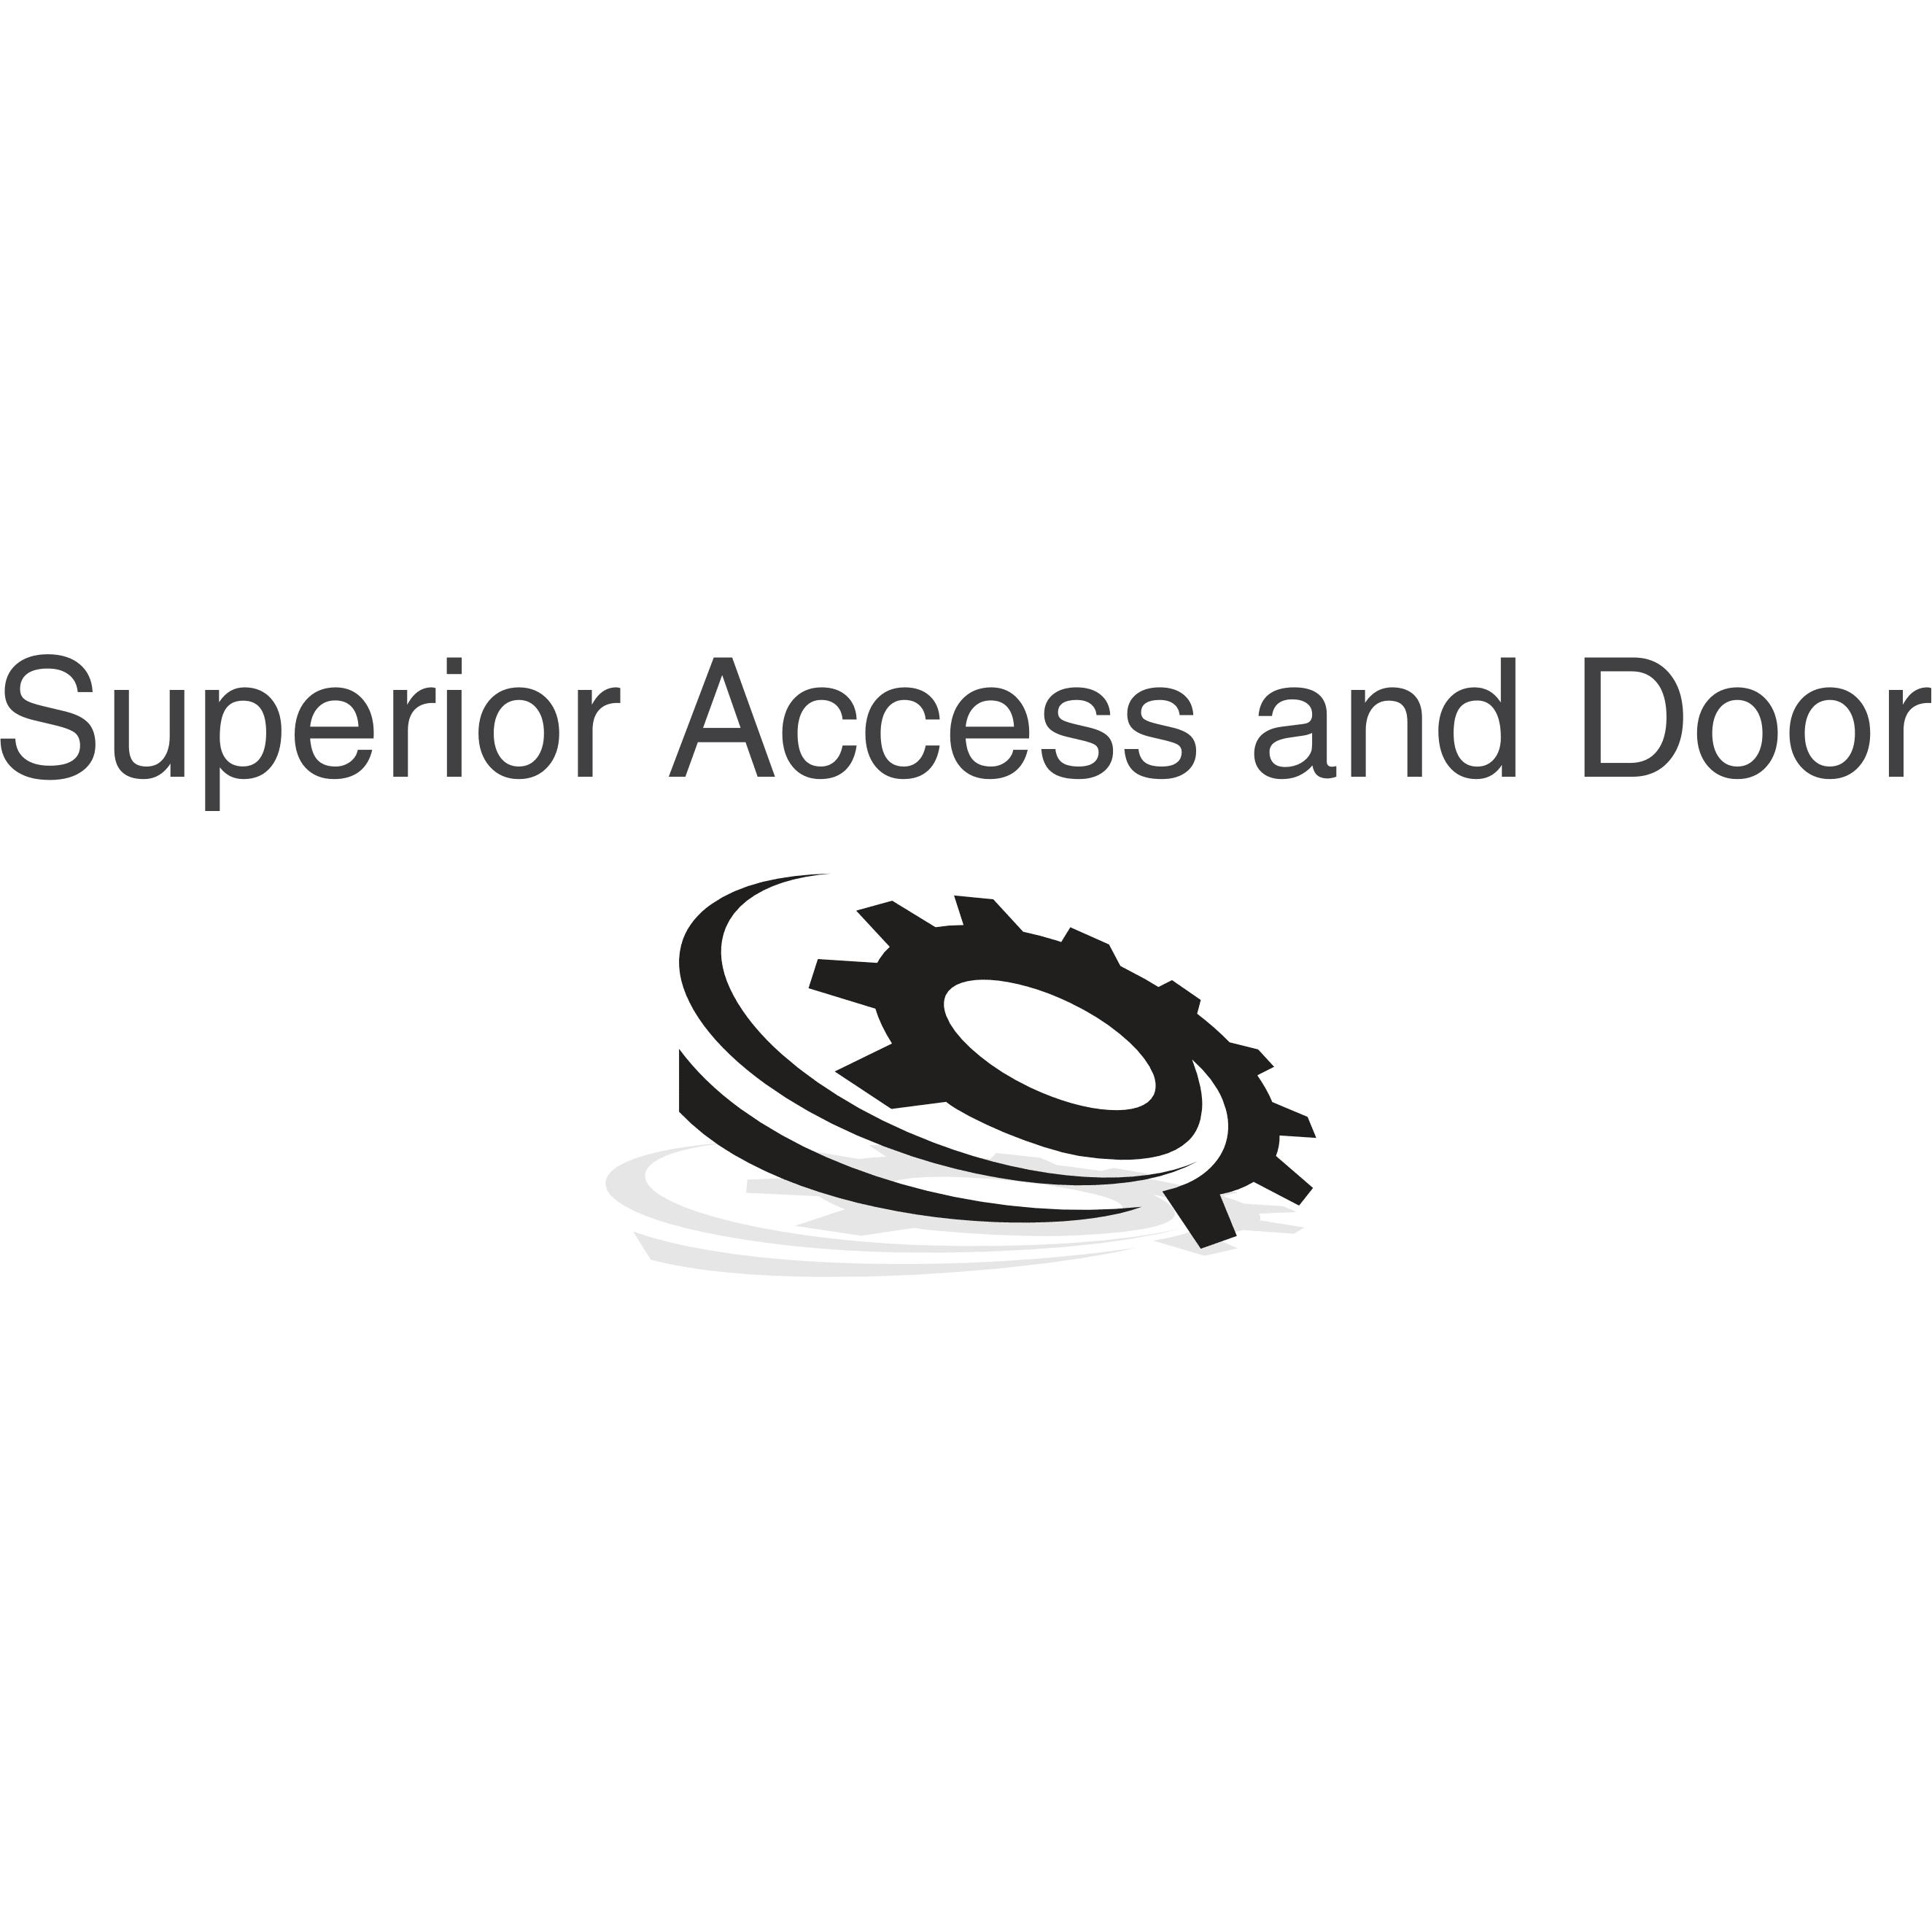 Superior Access and Door